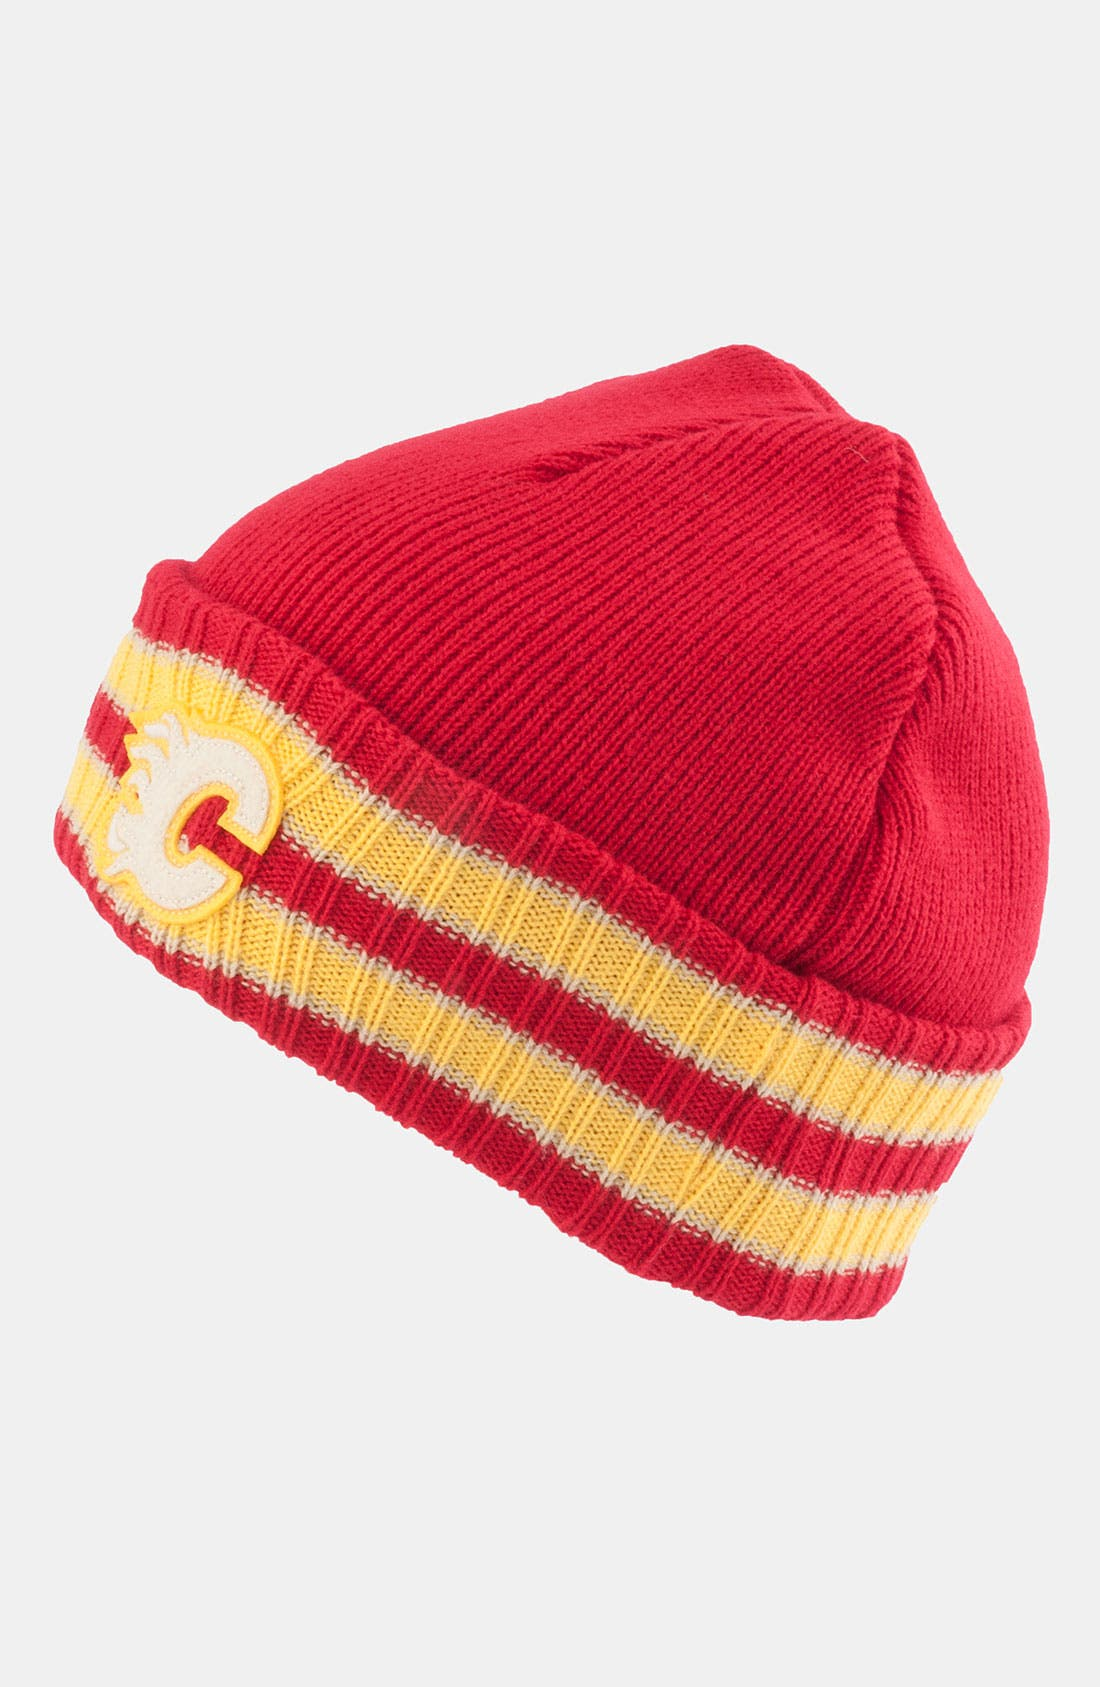 Alternate Image 1 Selected - American Needle 'Calgary Flames - Slash' Knit Hat